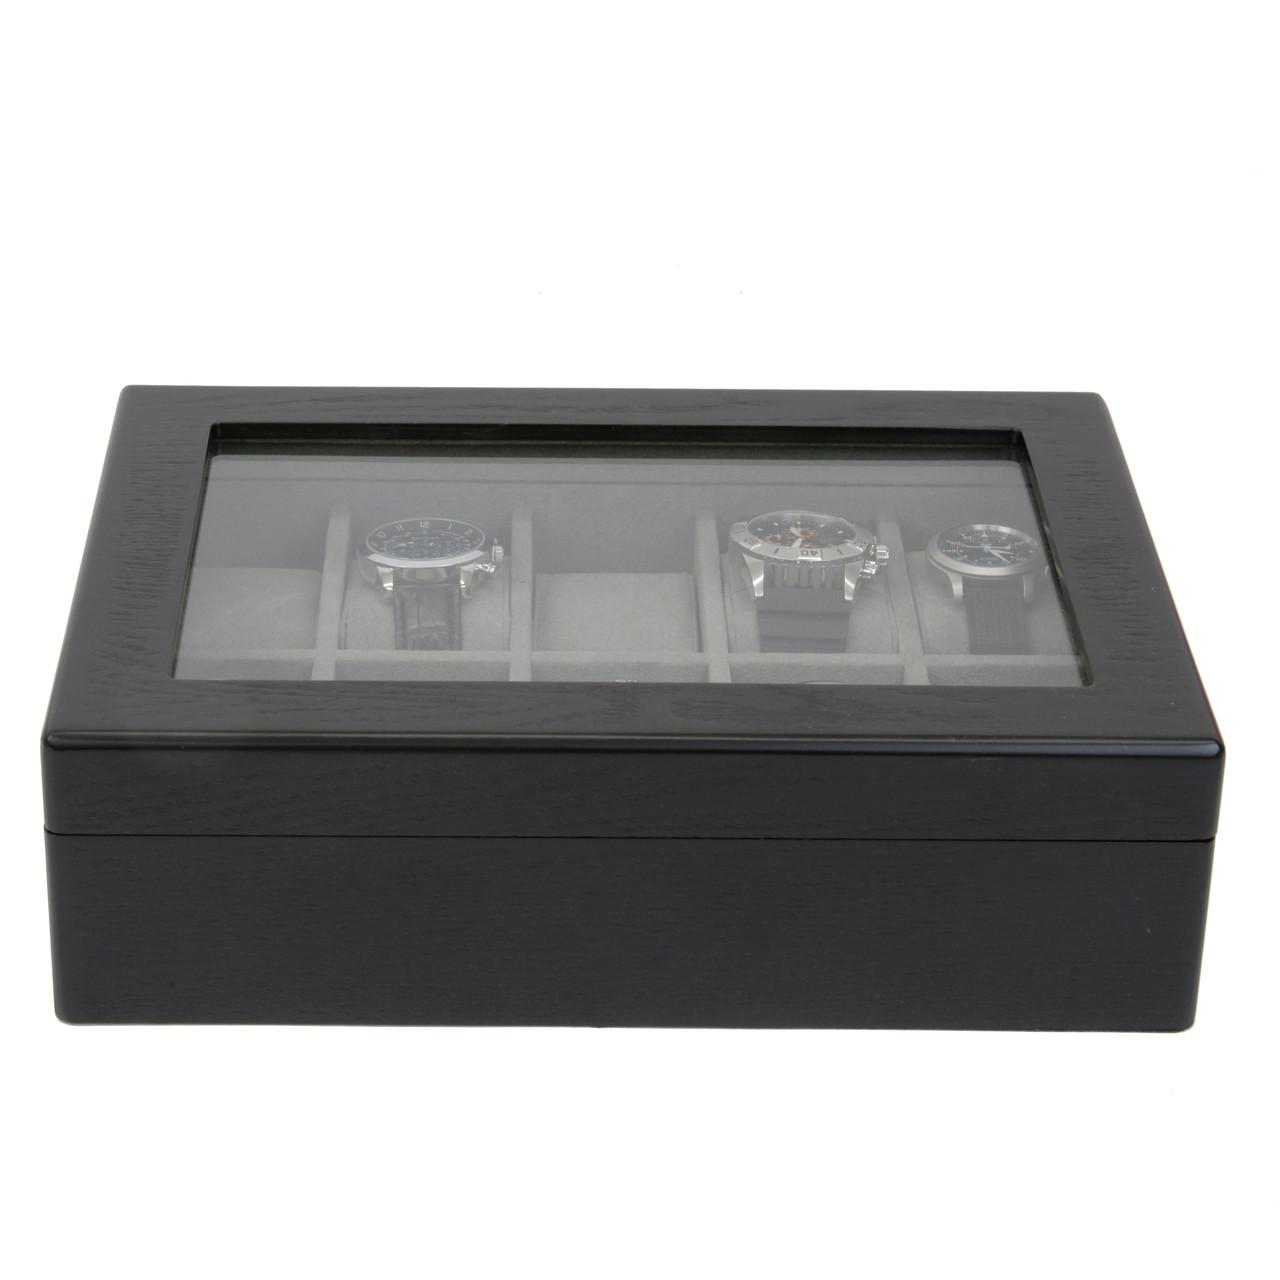 10 Watch Box in Black Ash Finish